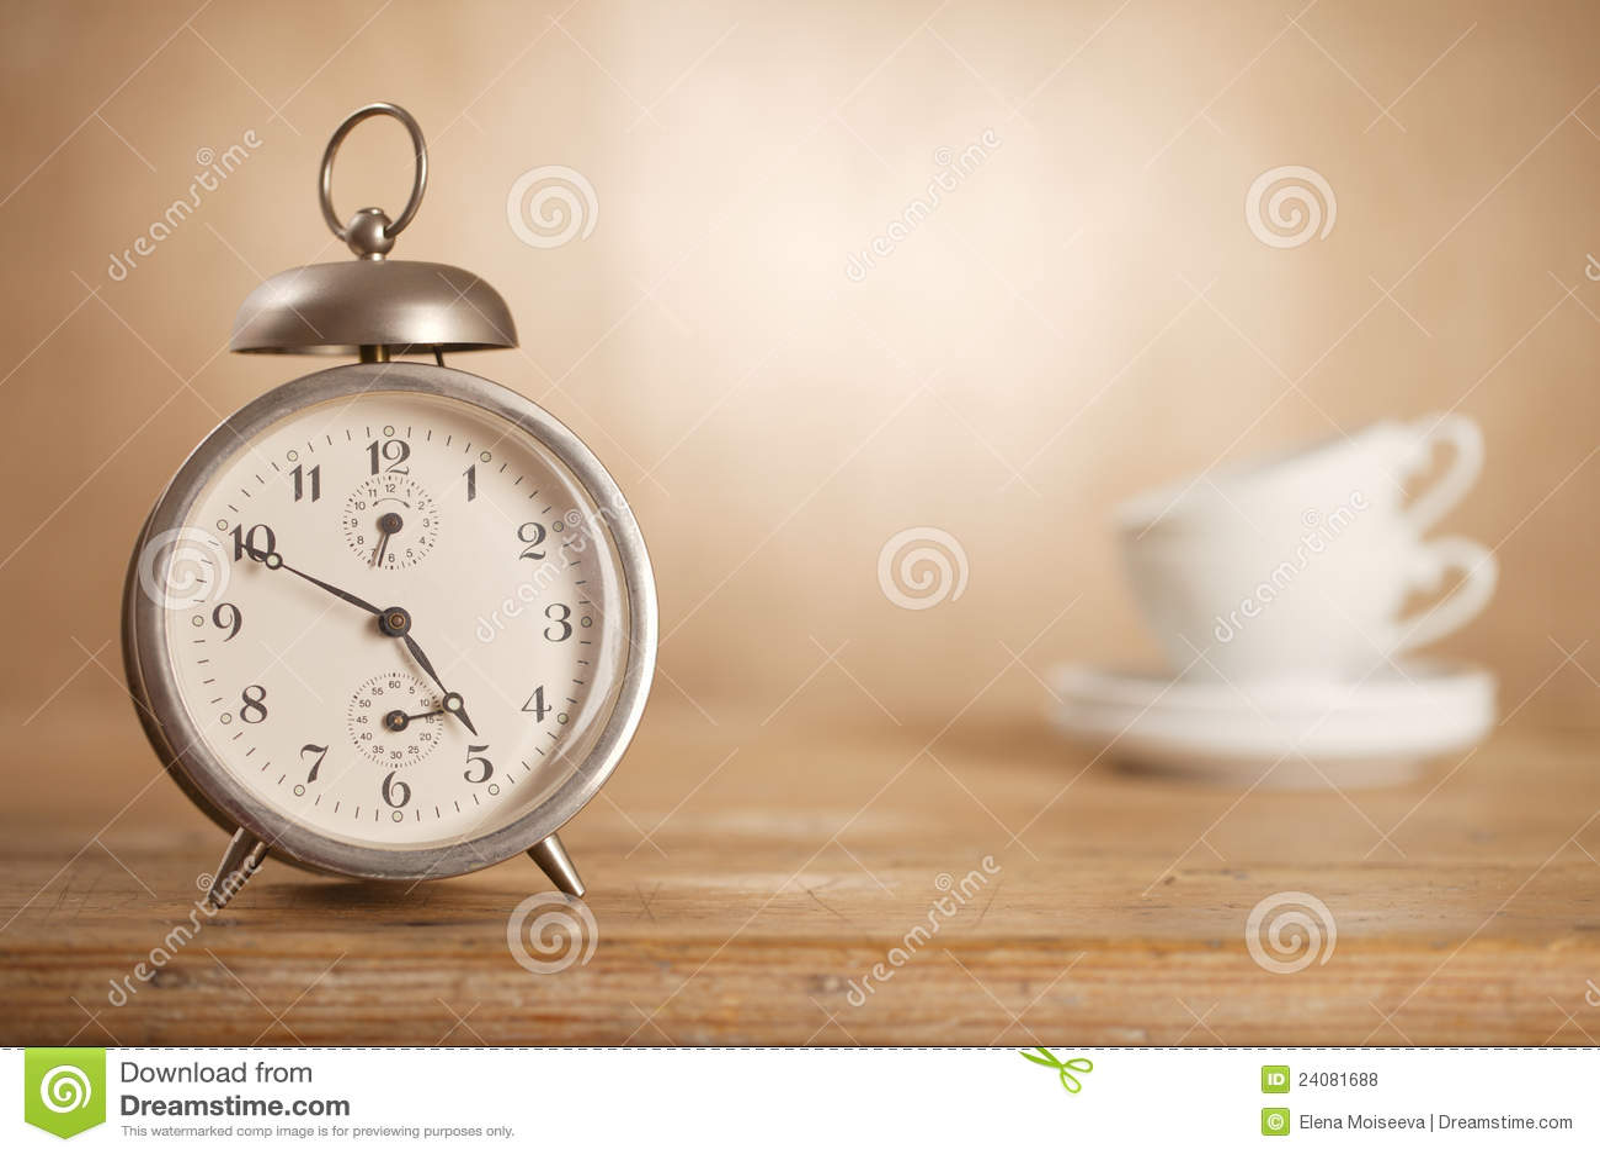 Original Homade Remote Control Mood Light TV Alarm Clock,Retro Television Digital Alarm Clock